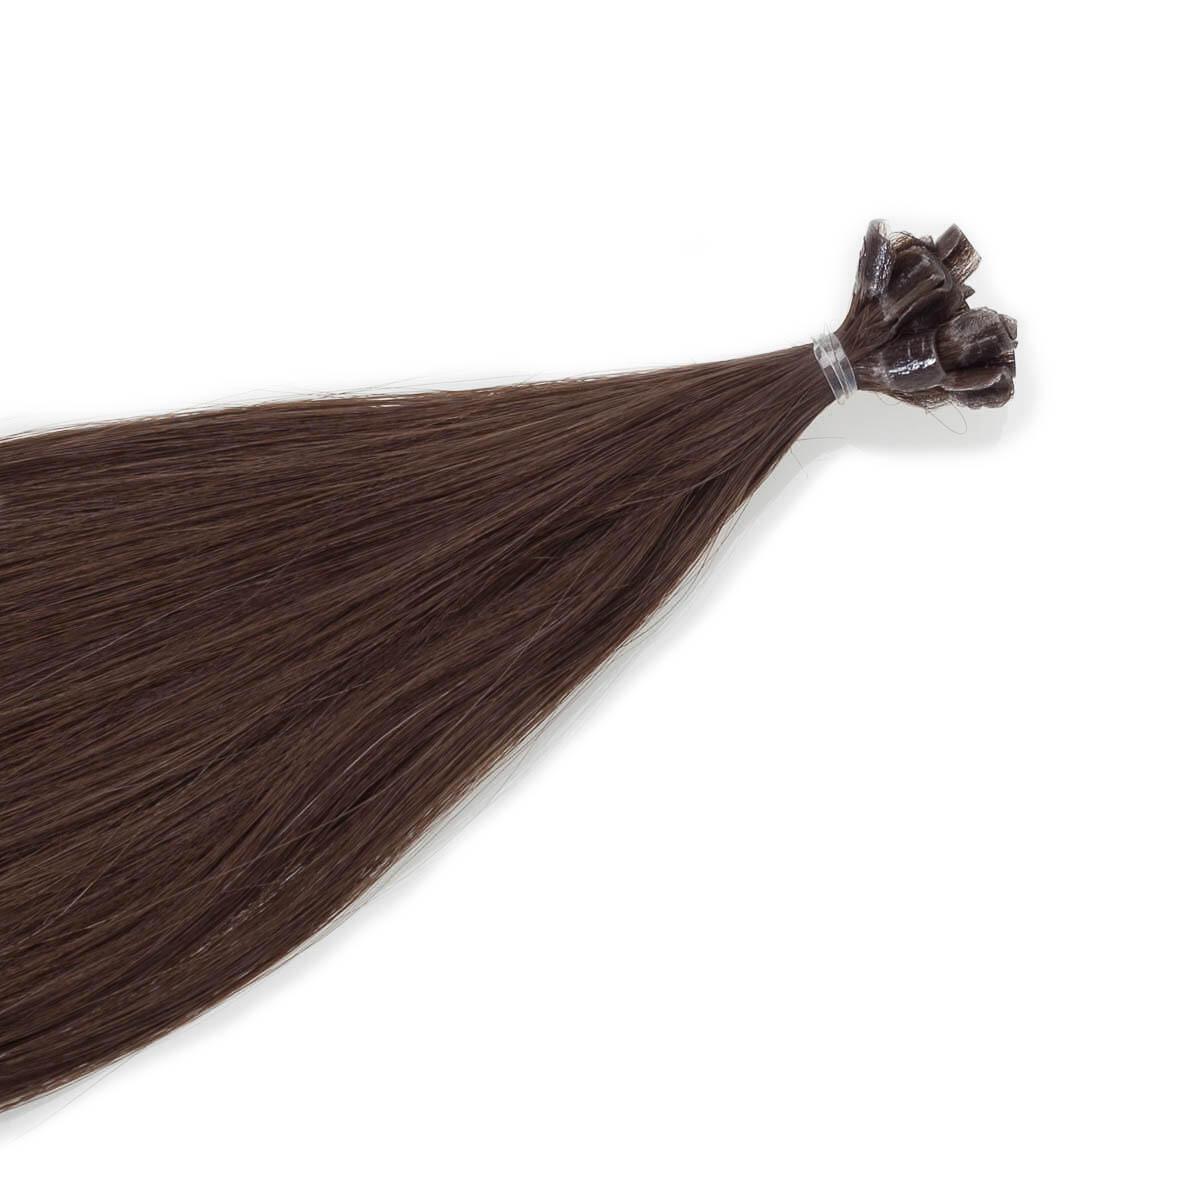 Nail Hair Original 2.6 Dark Ash Brown 30 cm